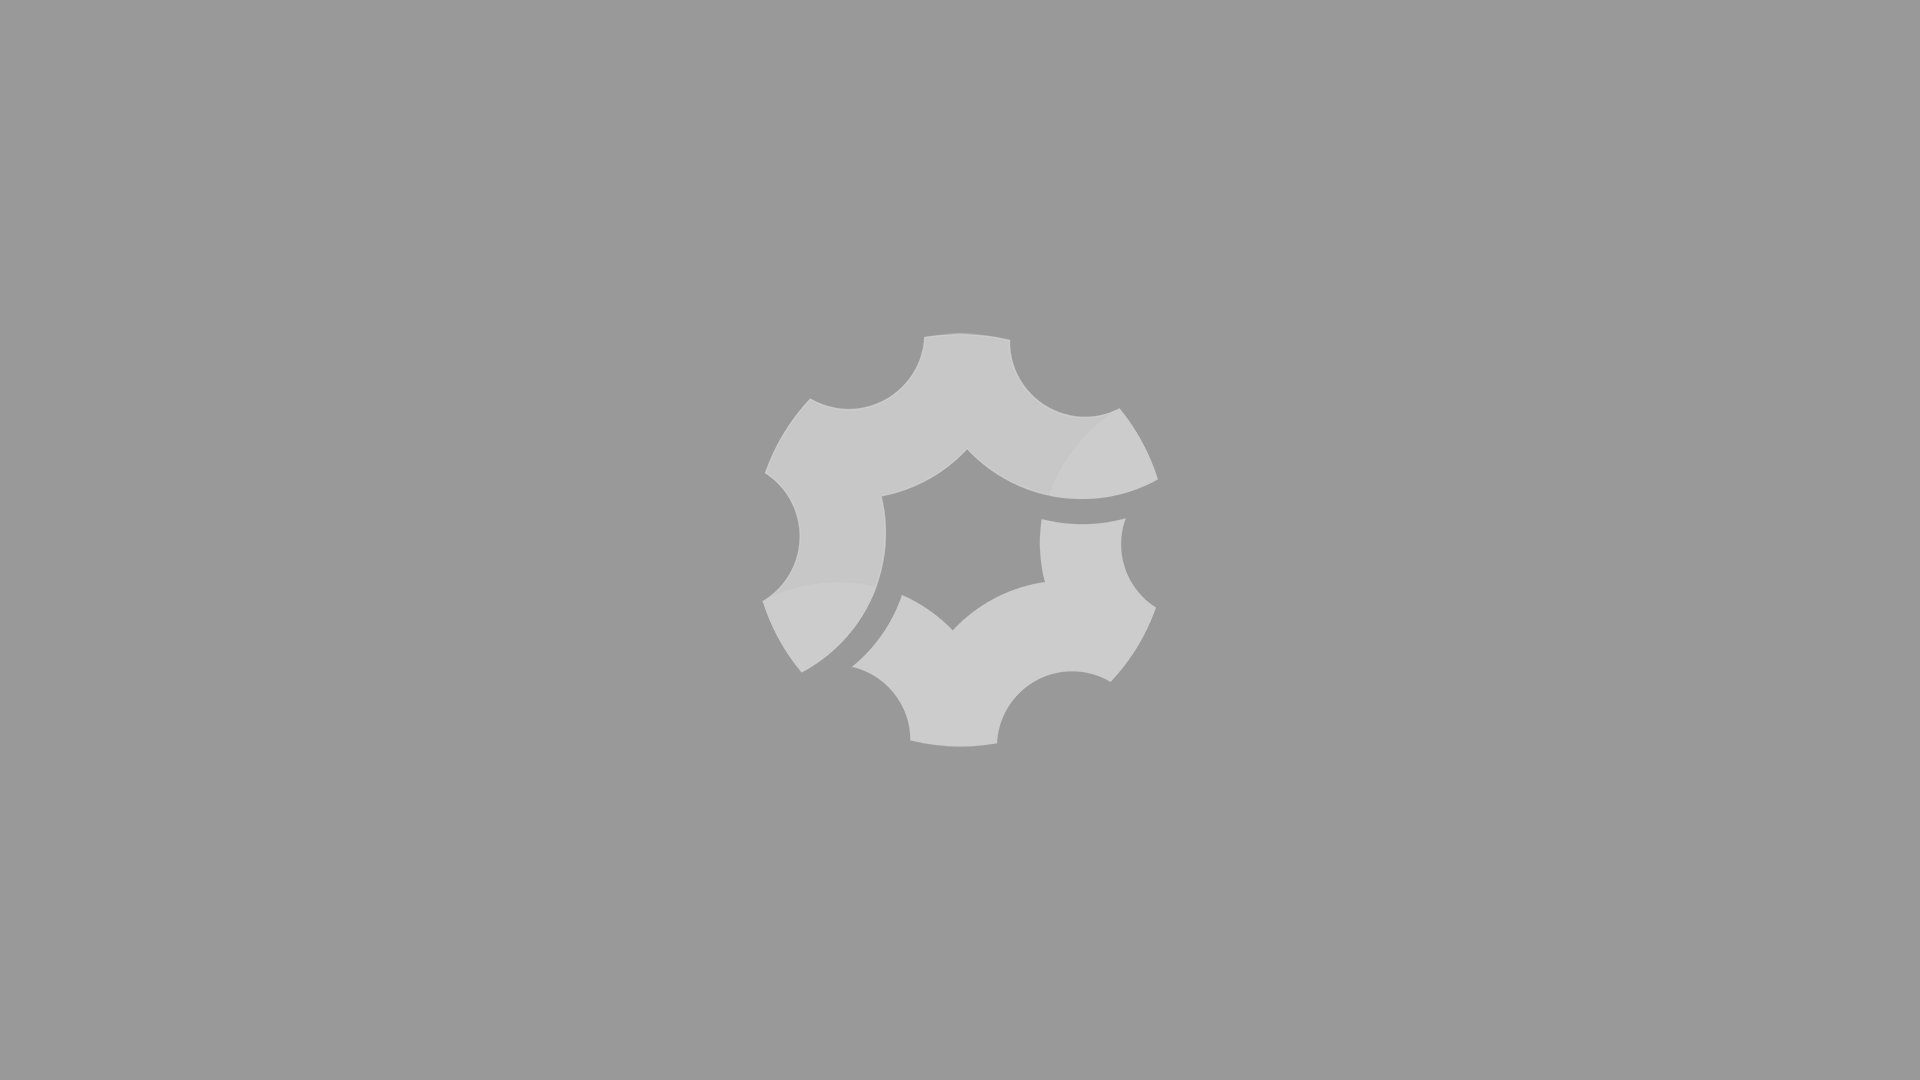 new_bitmap_image_5.bmp_thumb.png